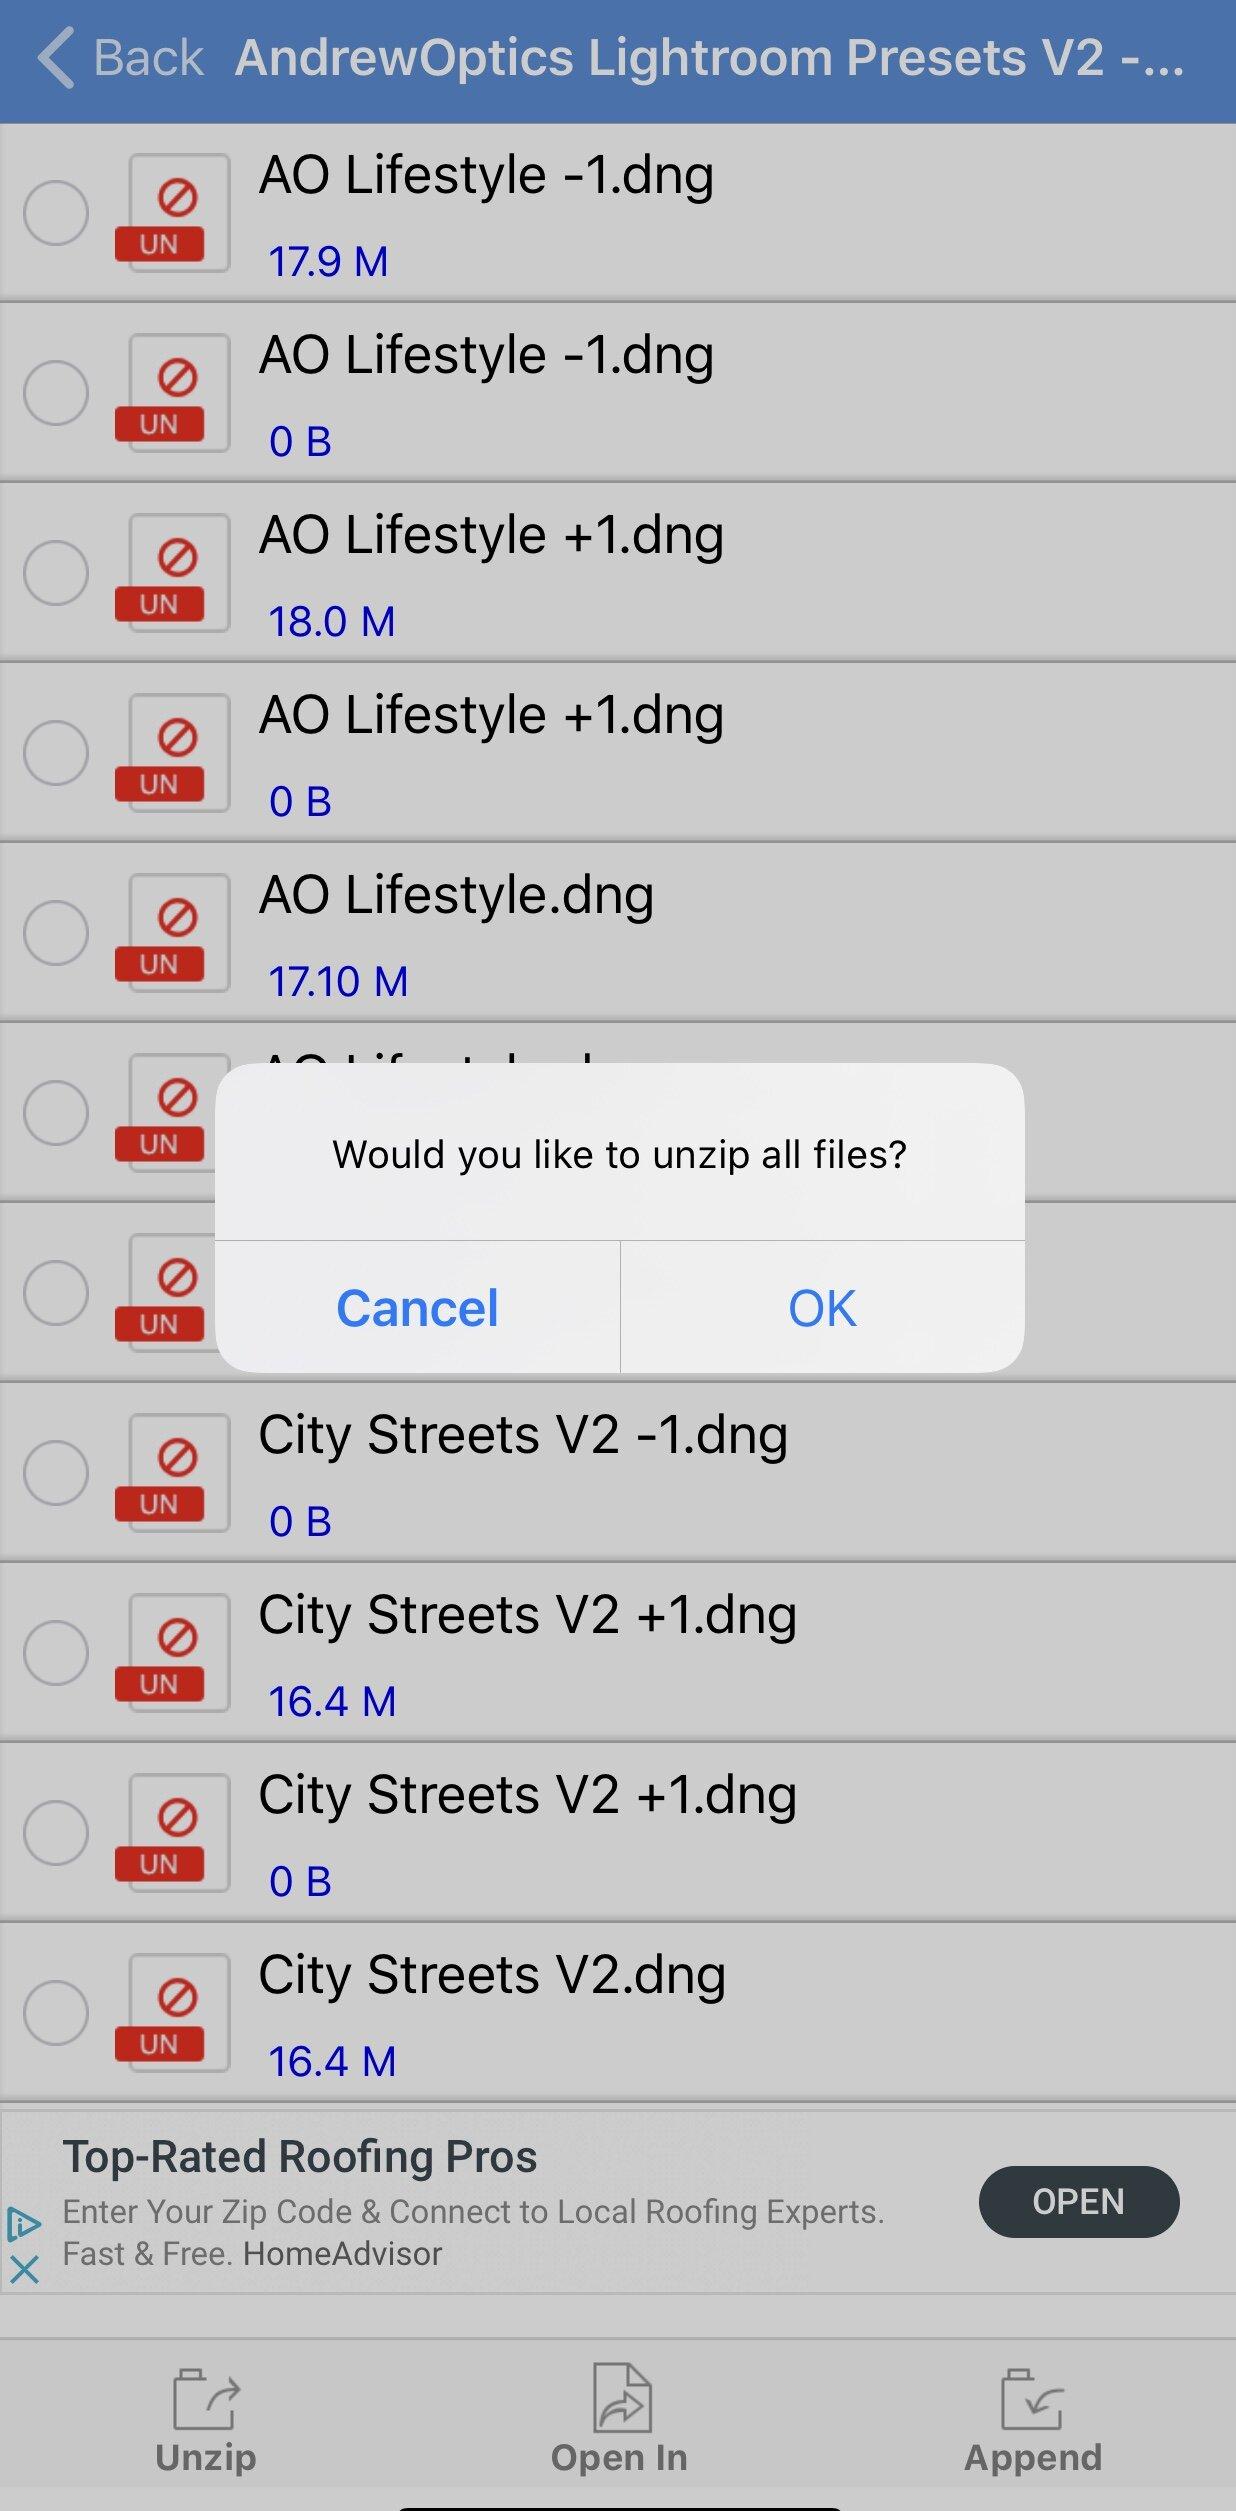 How to Install Lightroom Mobile Presets Without Desktop — AndrewOptics